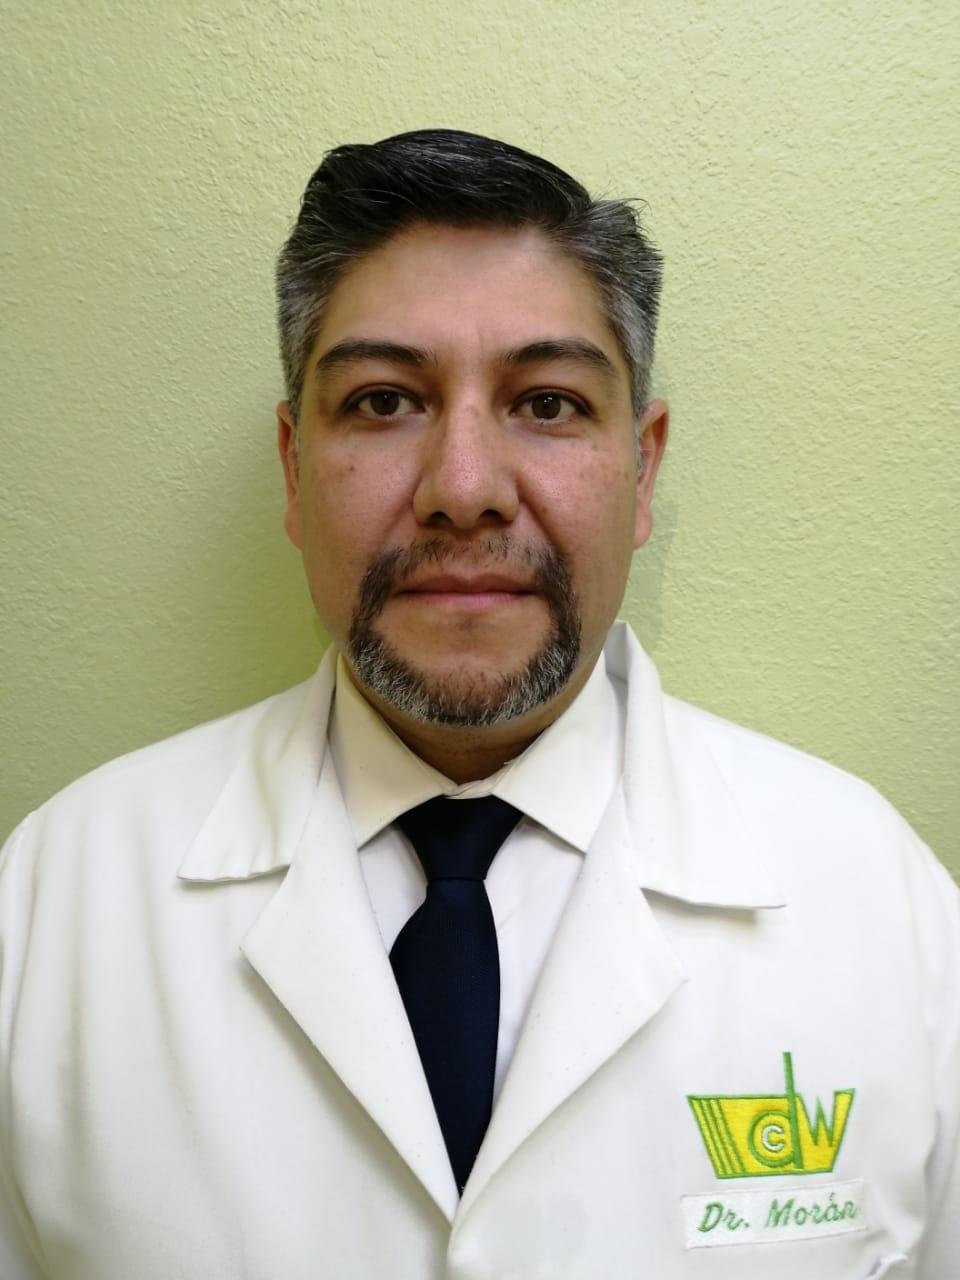 Alejandro Moran image